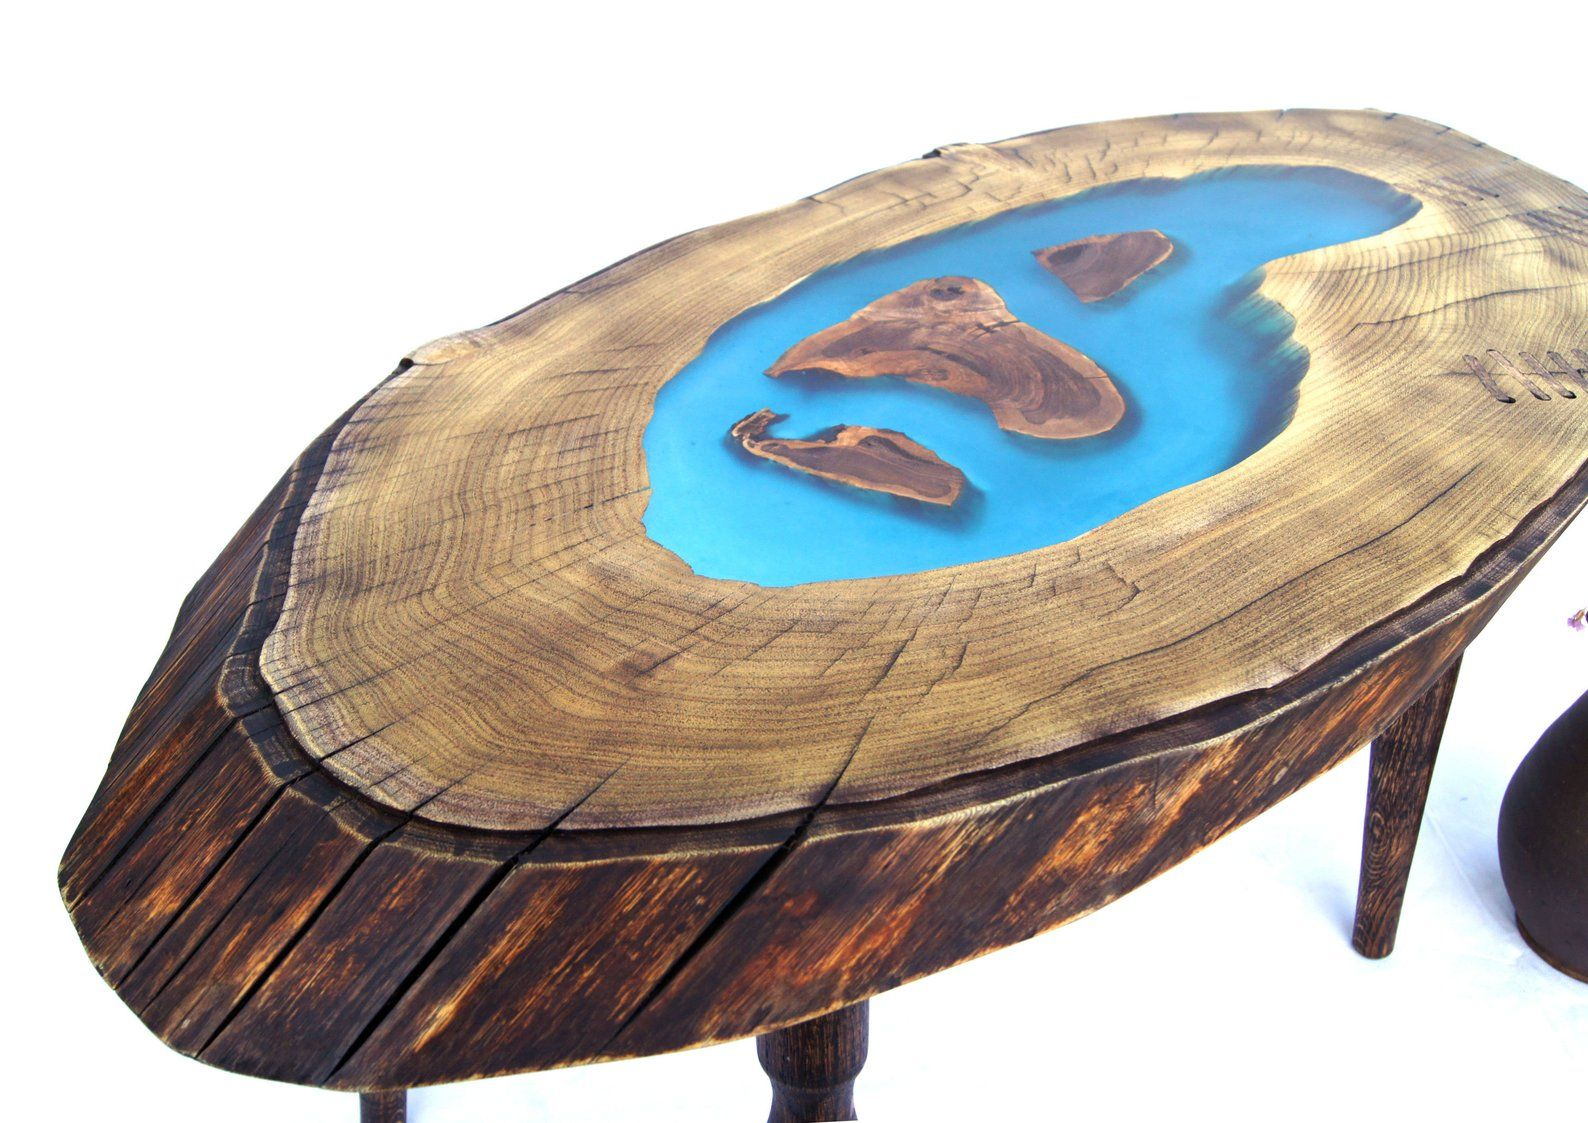 Live Edge Wood Slab Coffee Table Epoxy Resin River Desk Large Etsy Wood Slab Coffee Table Wood Live Edge Wood [ 1123 x 1588 Pixel ]